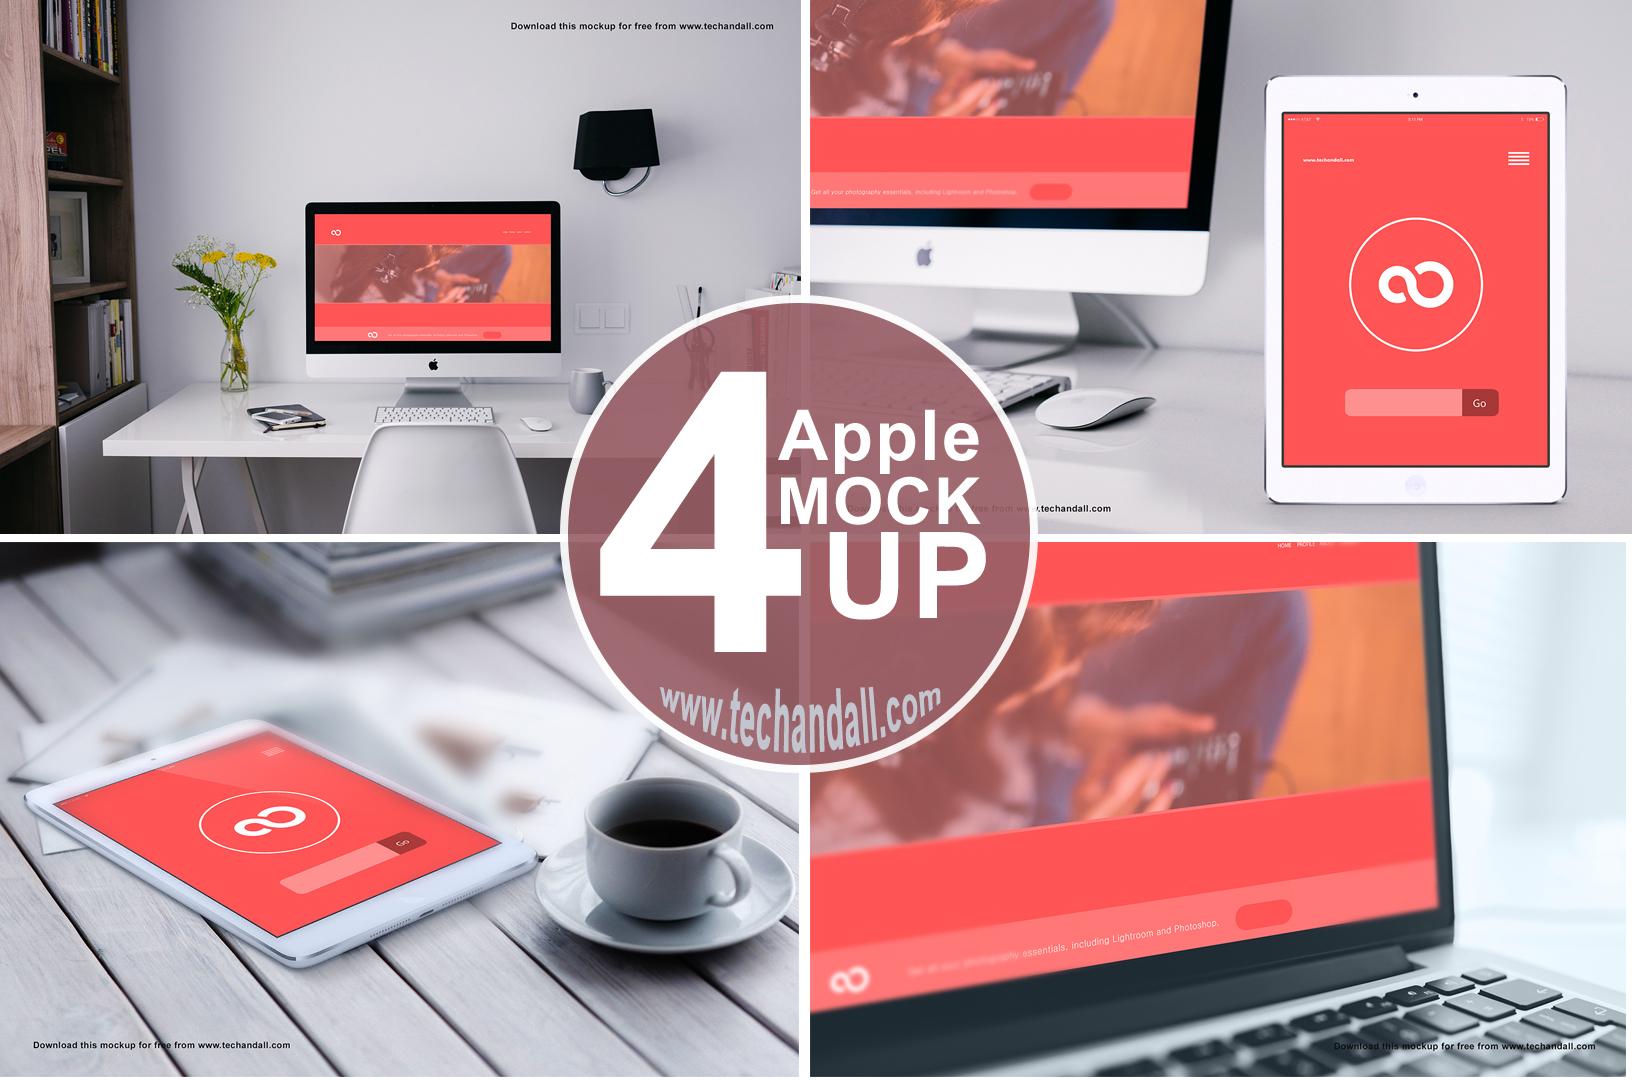 Apple Family Mock up PSD | Tech & ALL